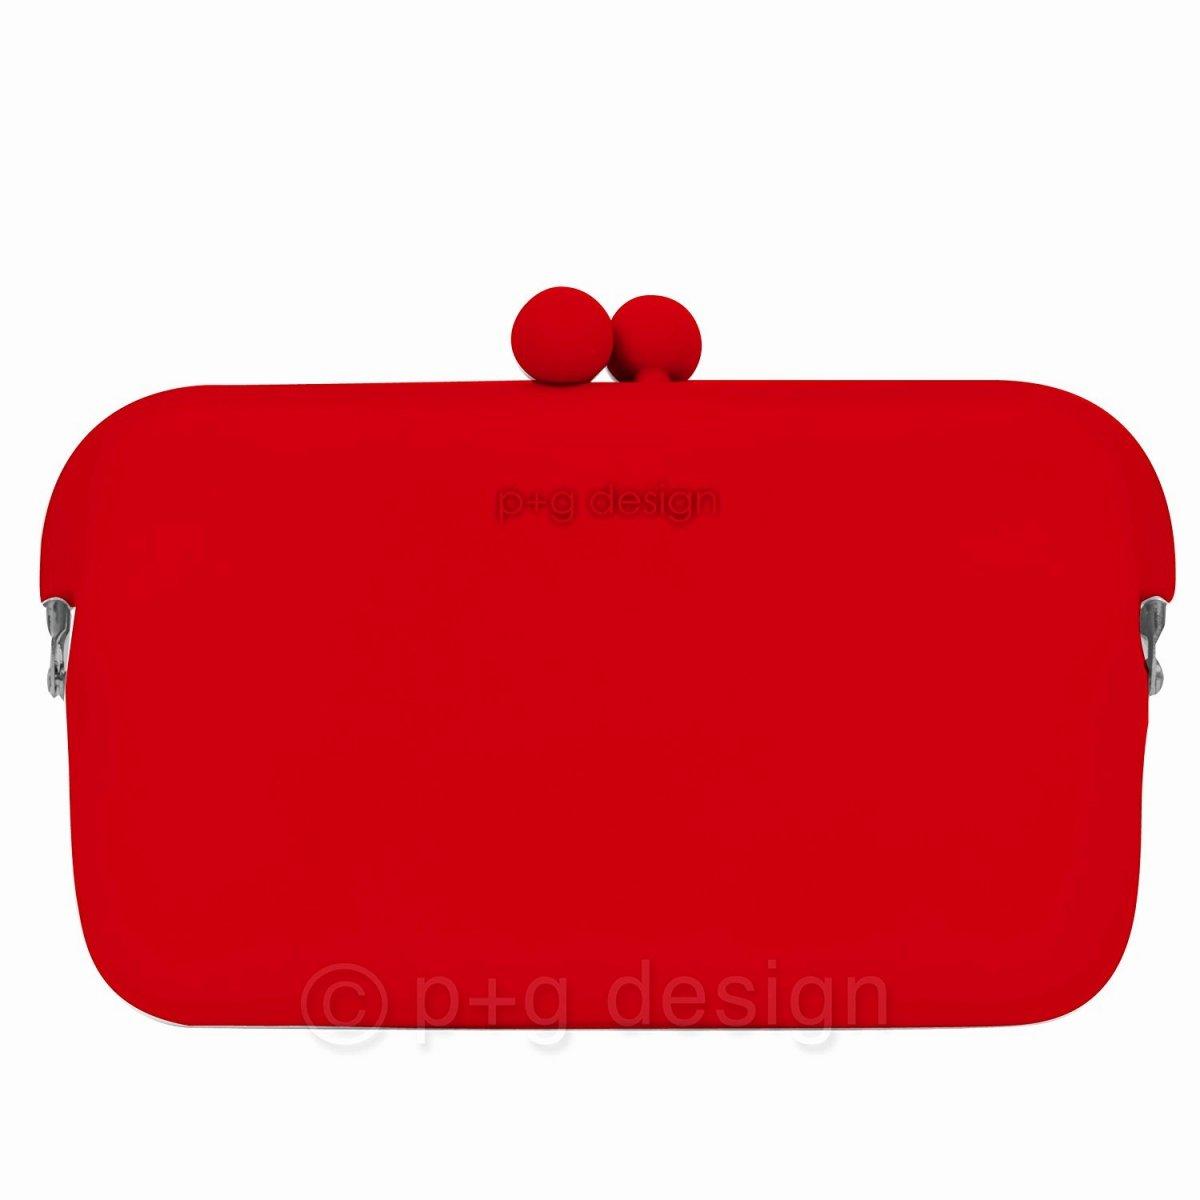 HAKKU Hair Iron GMC Toysfield p + g Design Hachi (bee) red PG-16203 Medium Clear ELECONCE 4582406770399